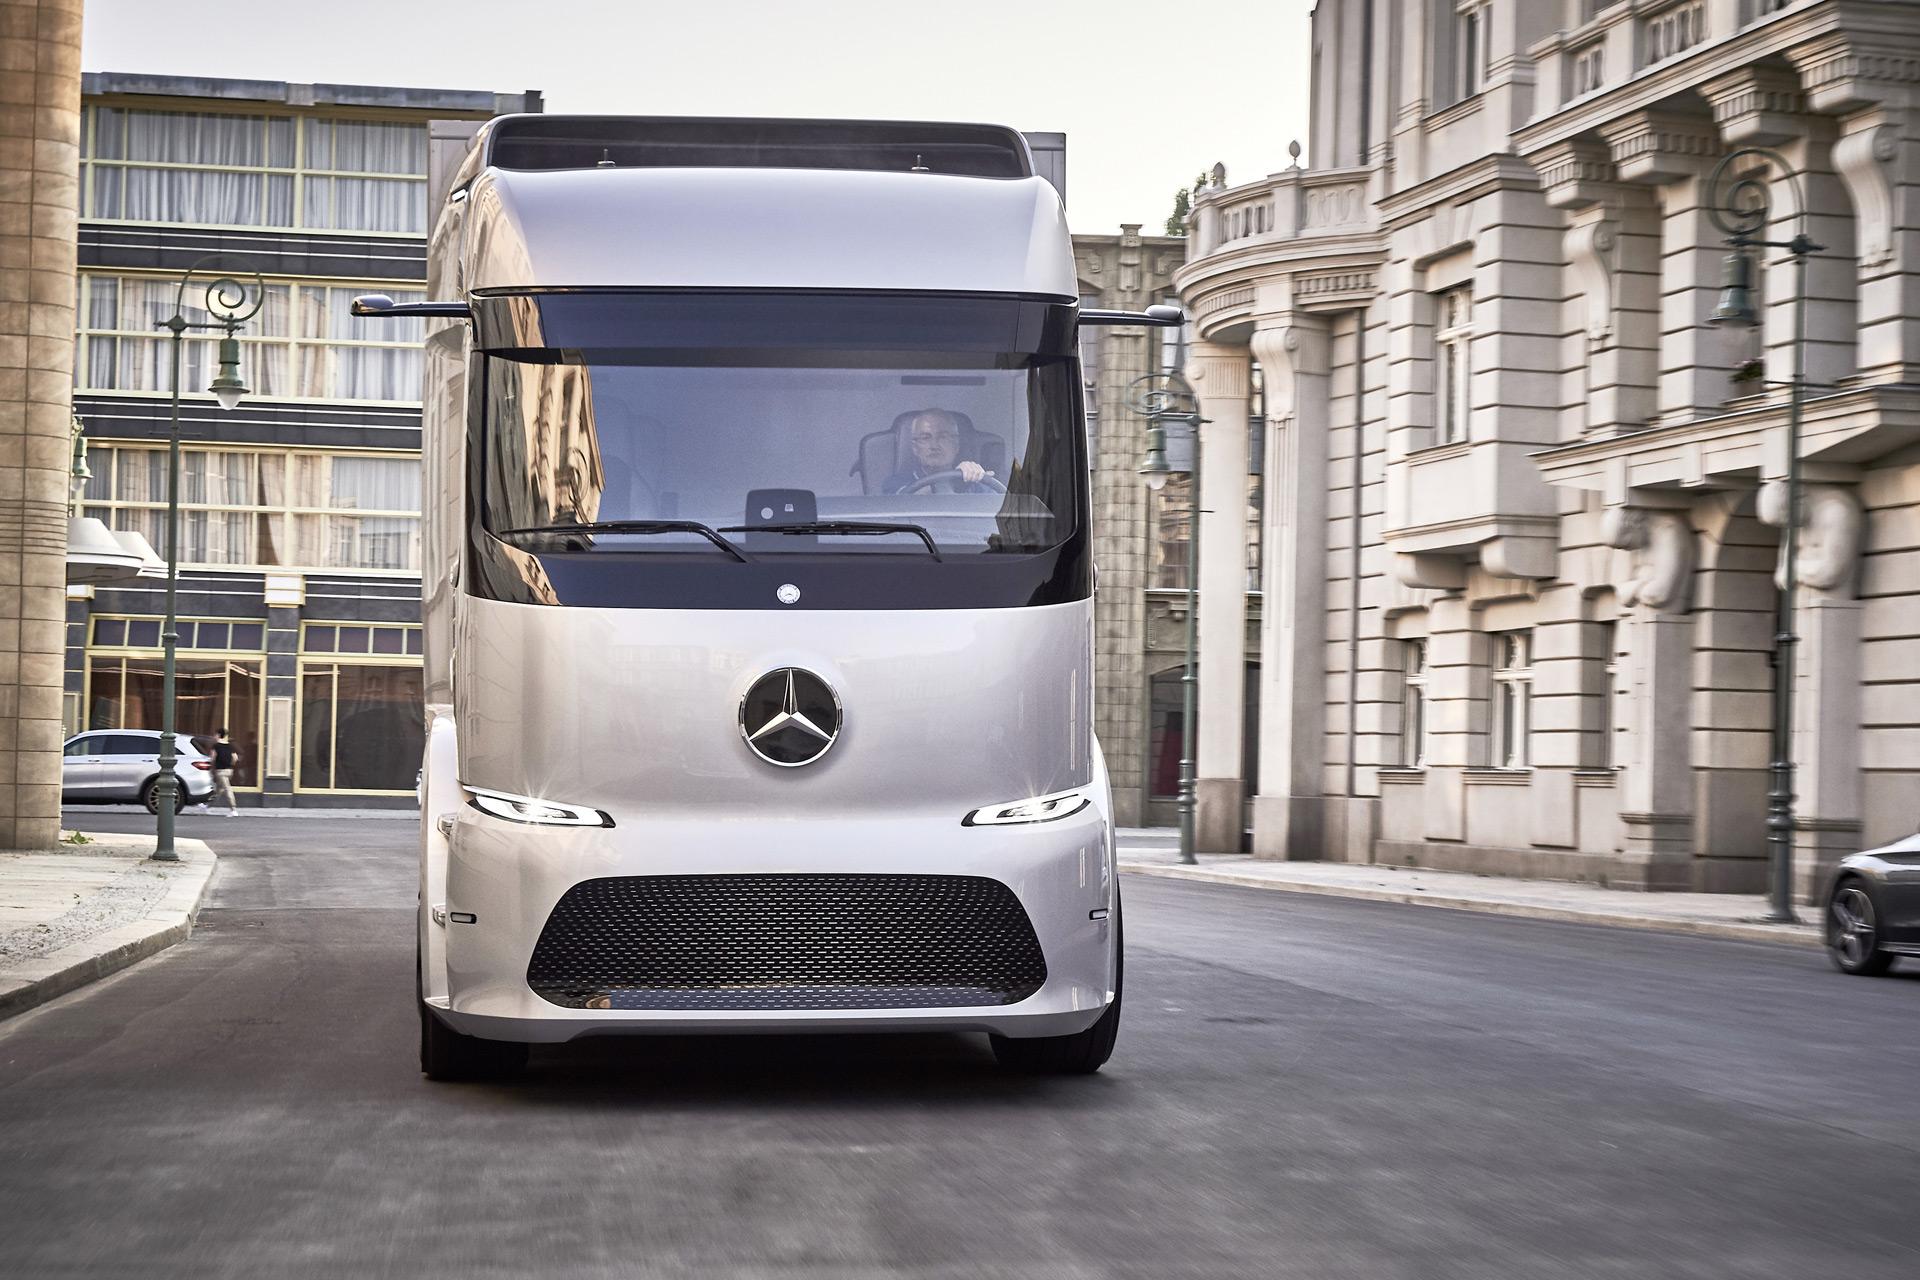 Mercedes Urban Etruck Infiniti Q60 Convertible Tesla